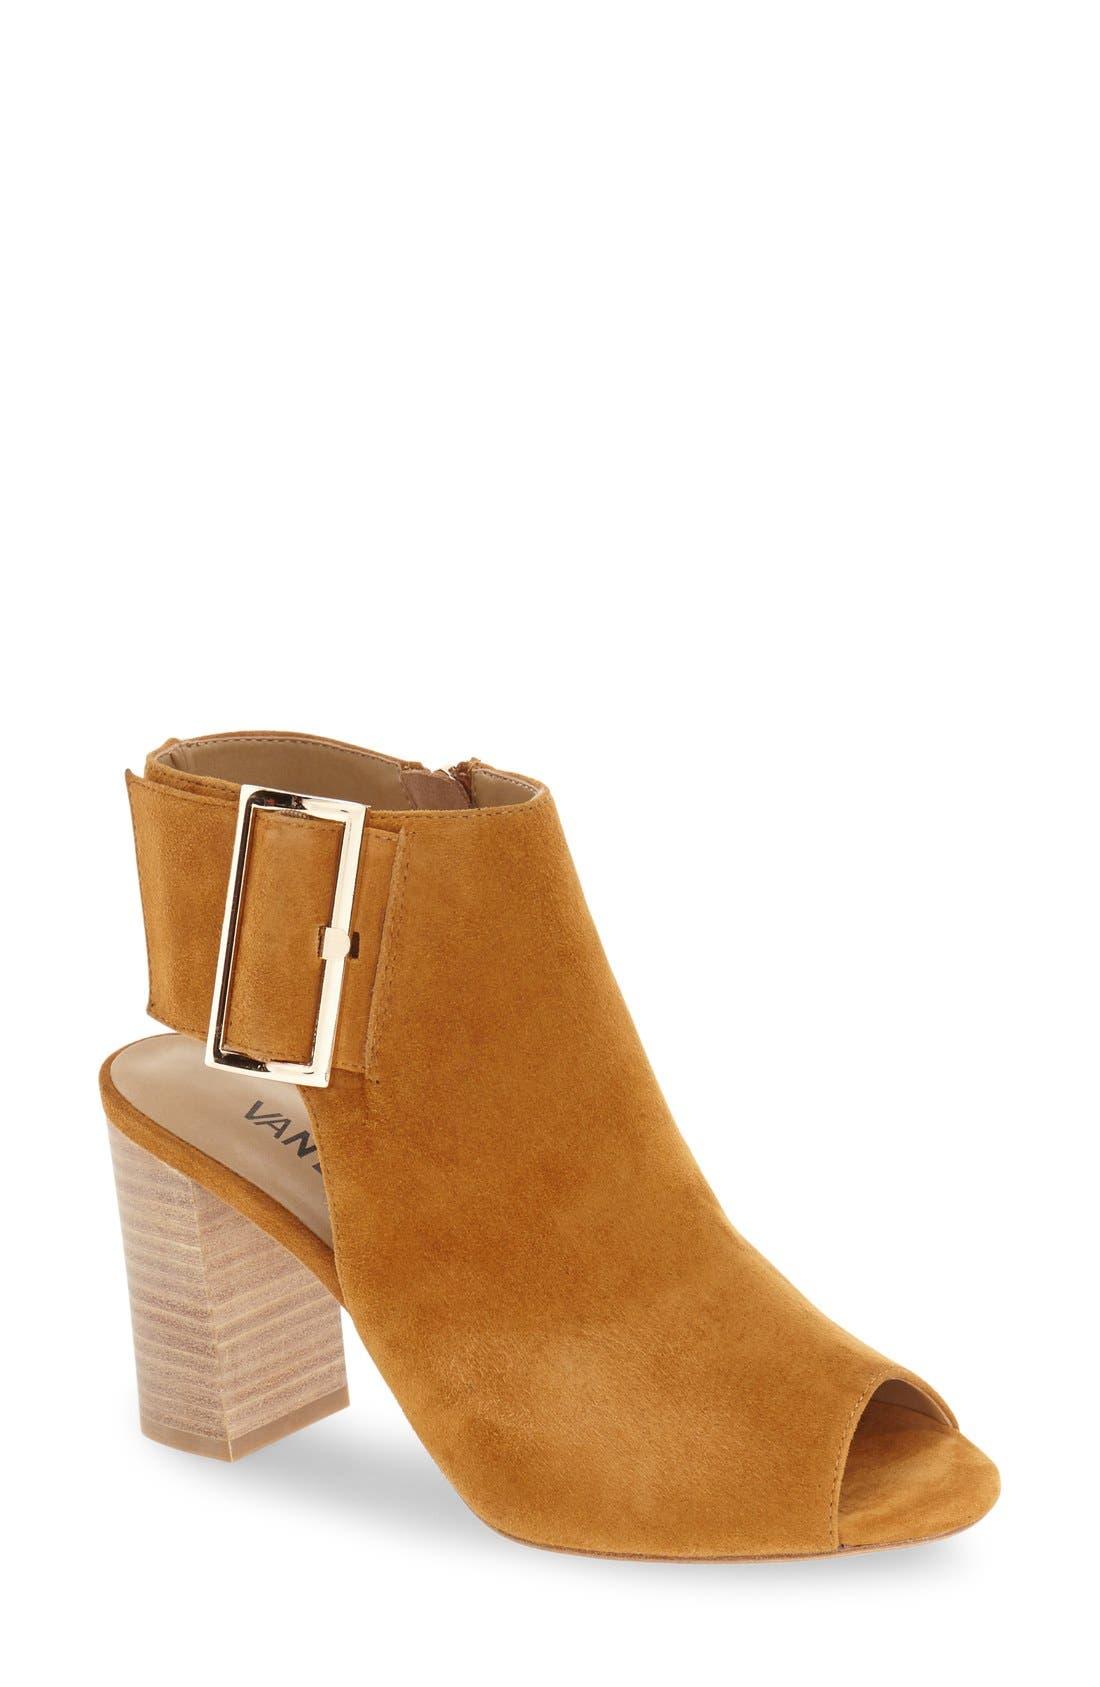 'Bisa' Peep Toe Slingback Sandal,                             Main thumbnail 2, color,